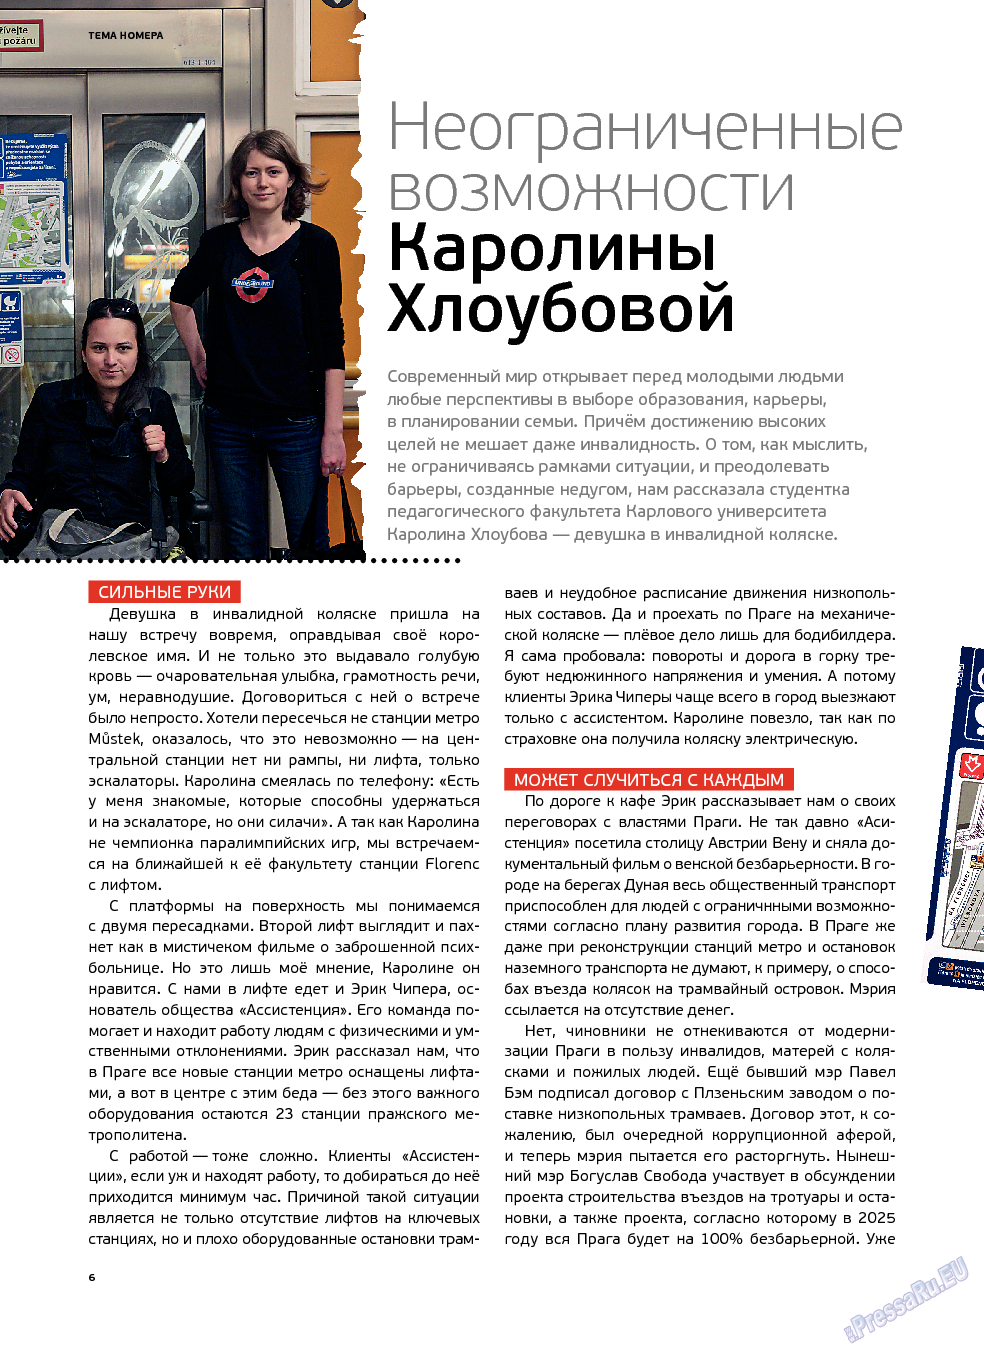 Артек (журнал). 2013 год, номер 2, стр. 8